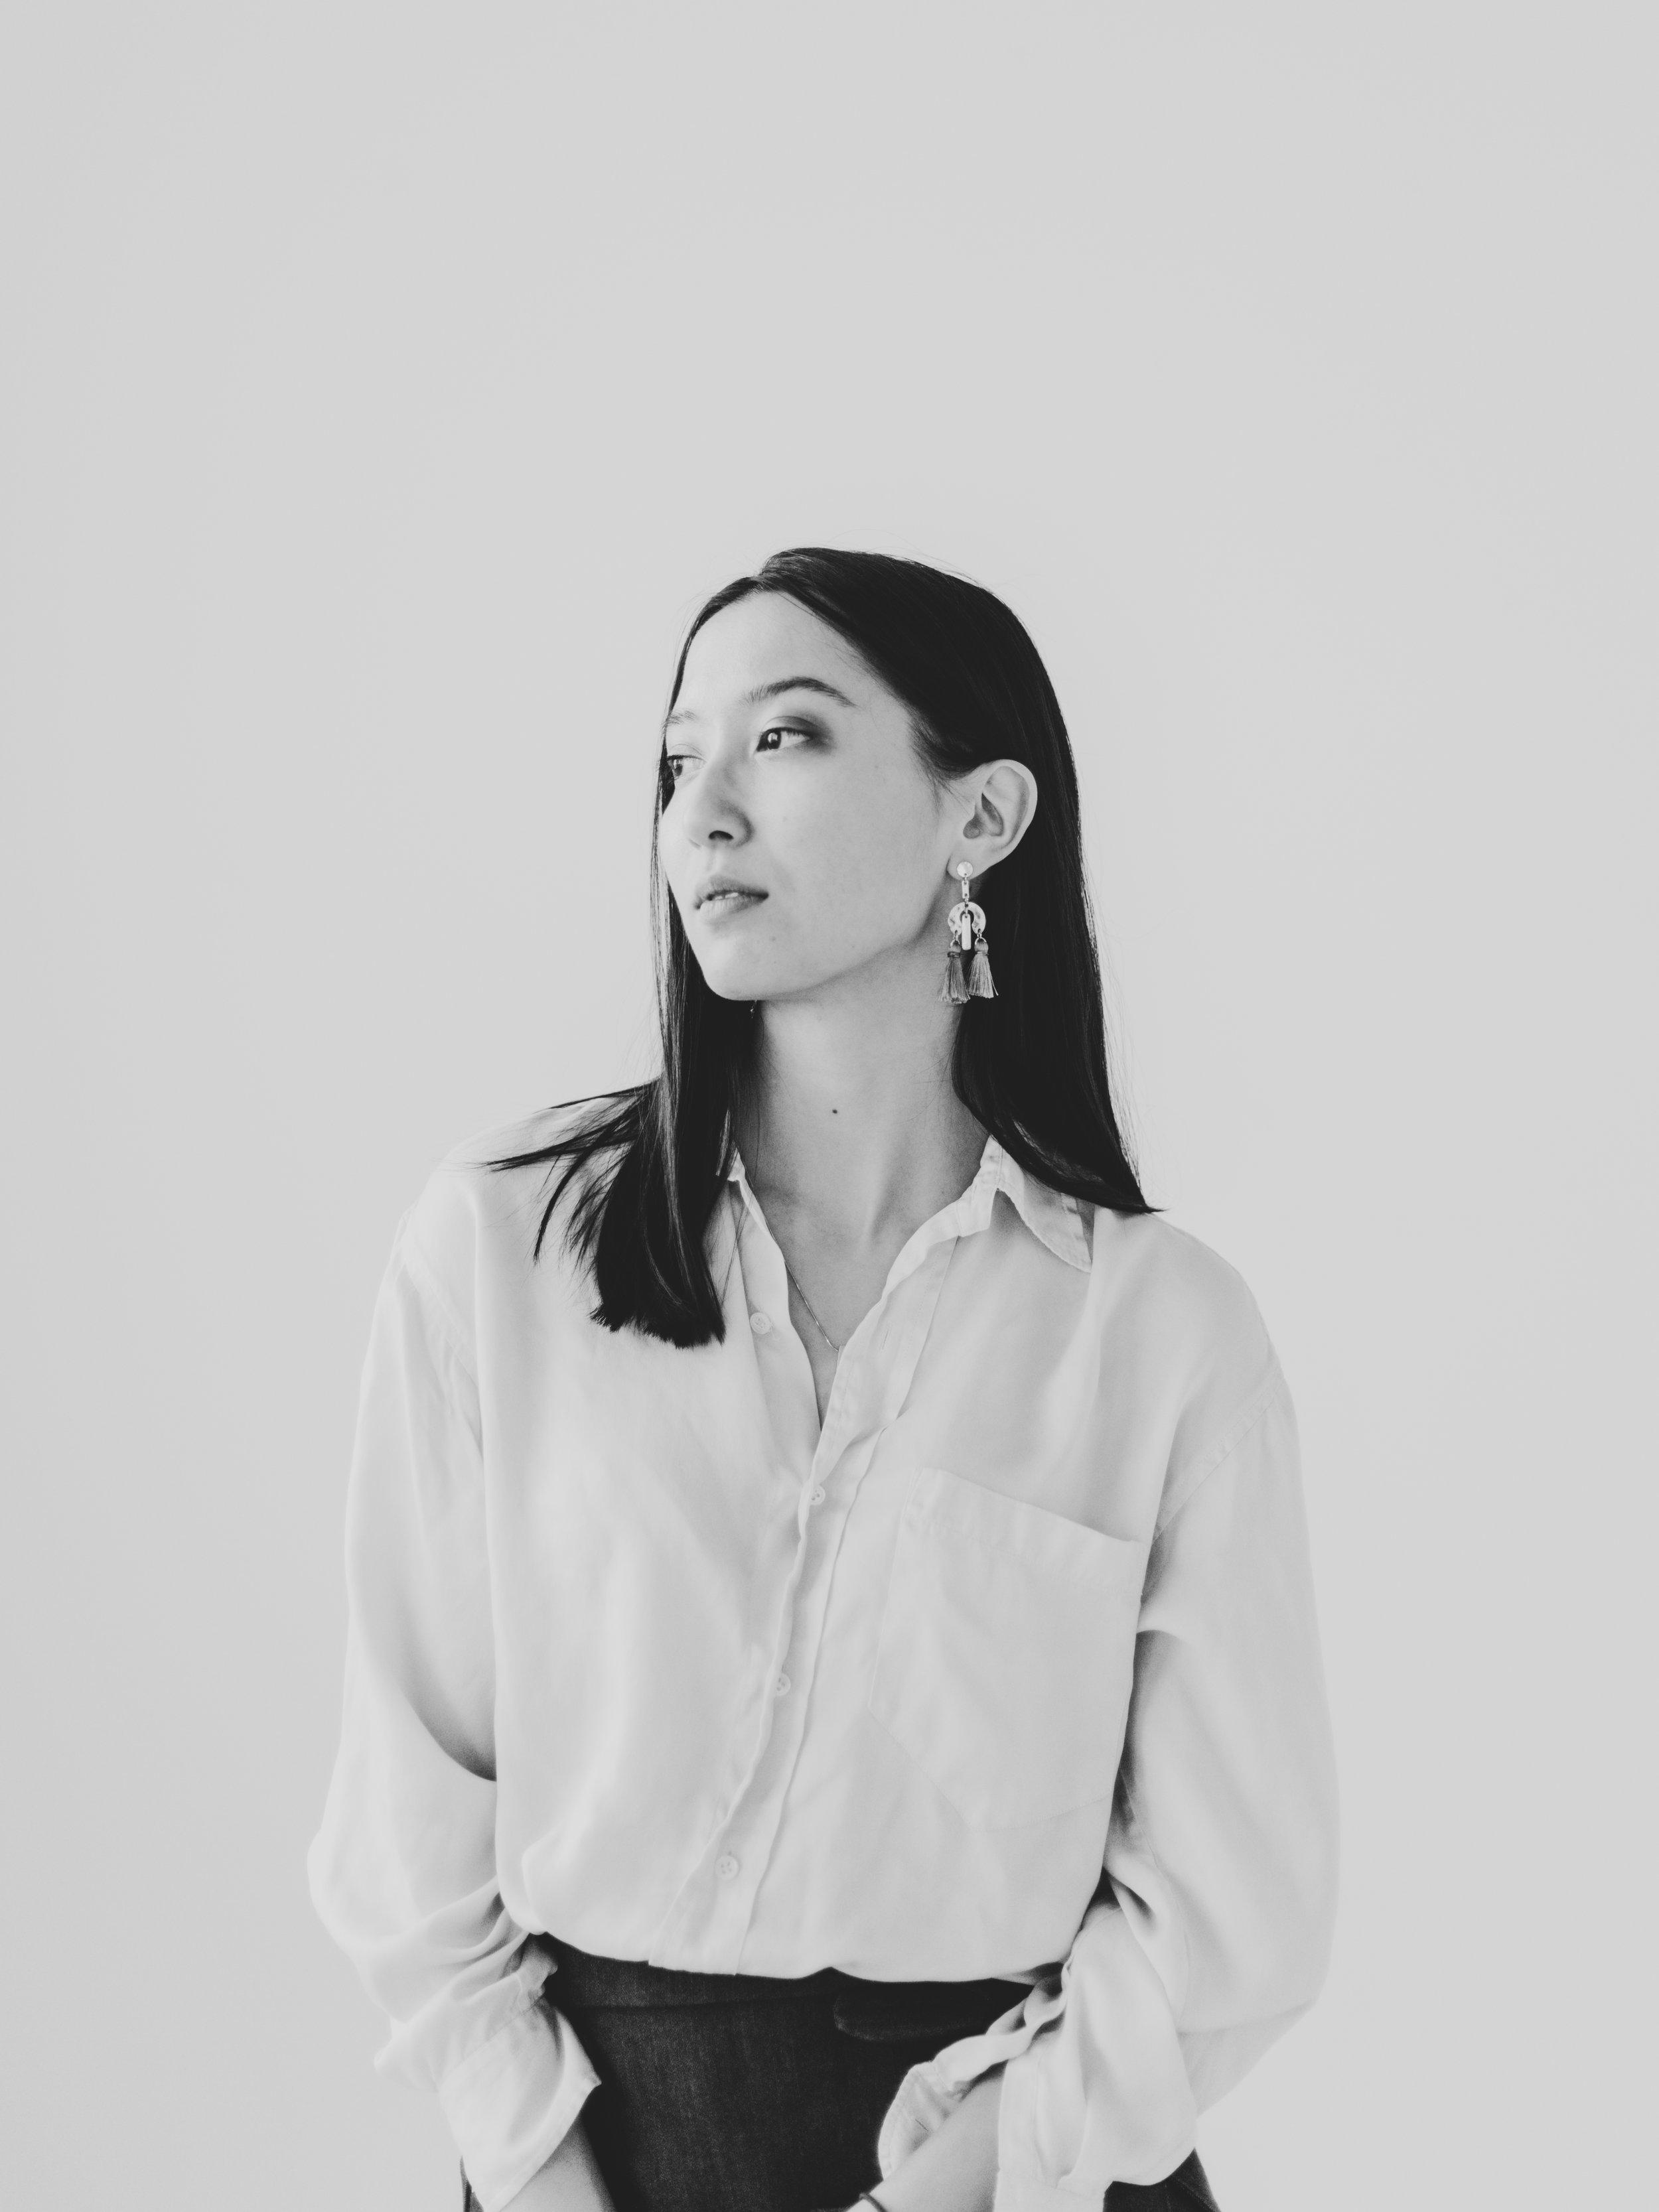 Erica-3.jpg